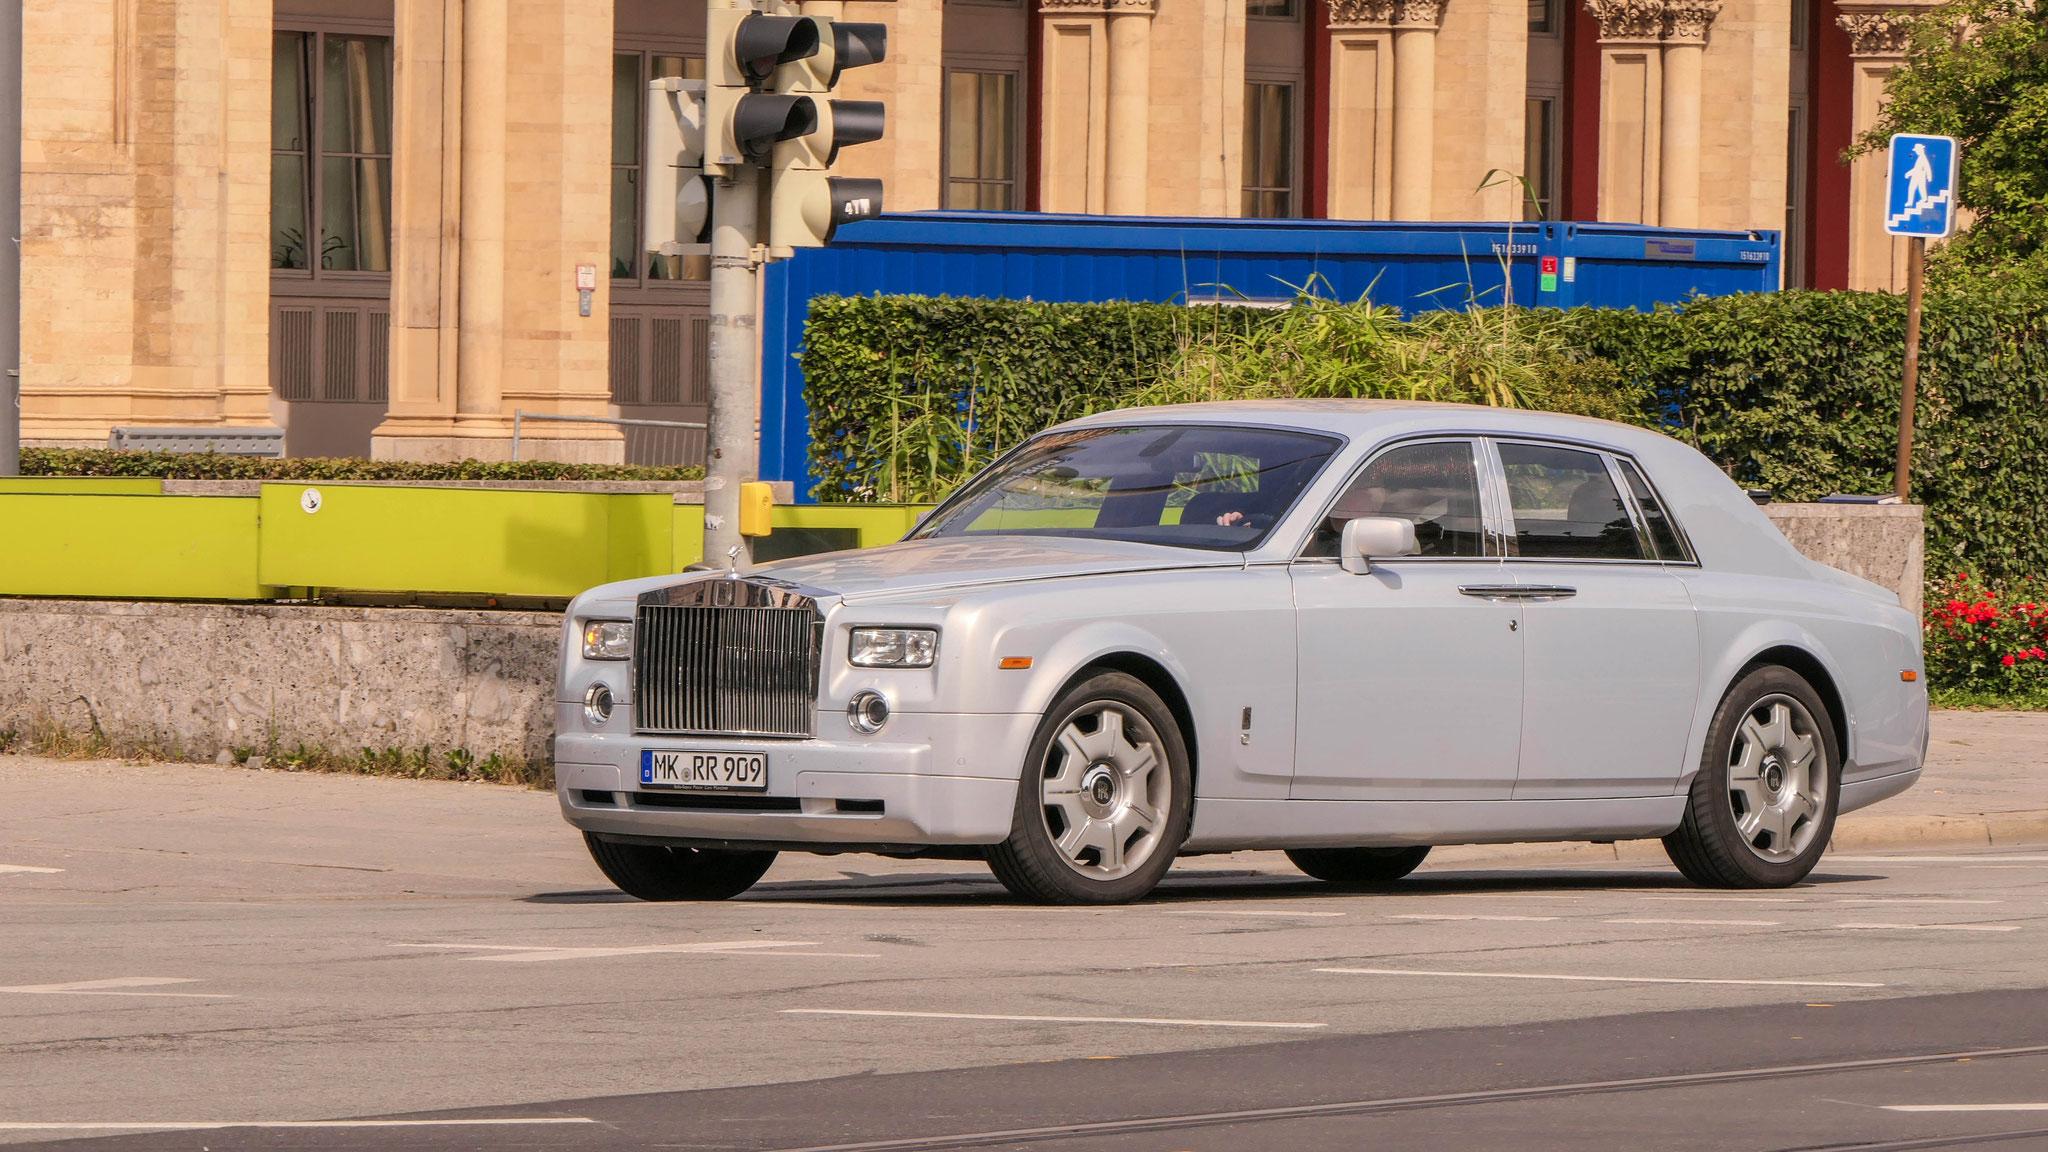 Rolls Royce Phantom - MK-RR-909